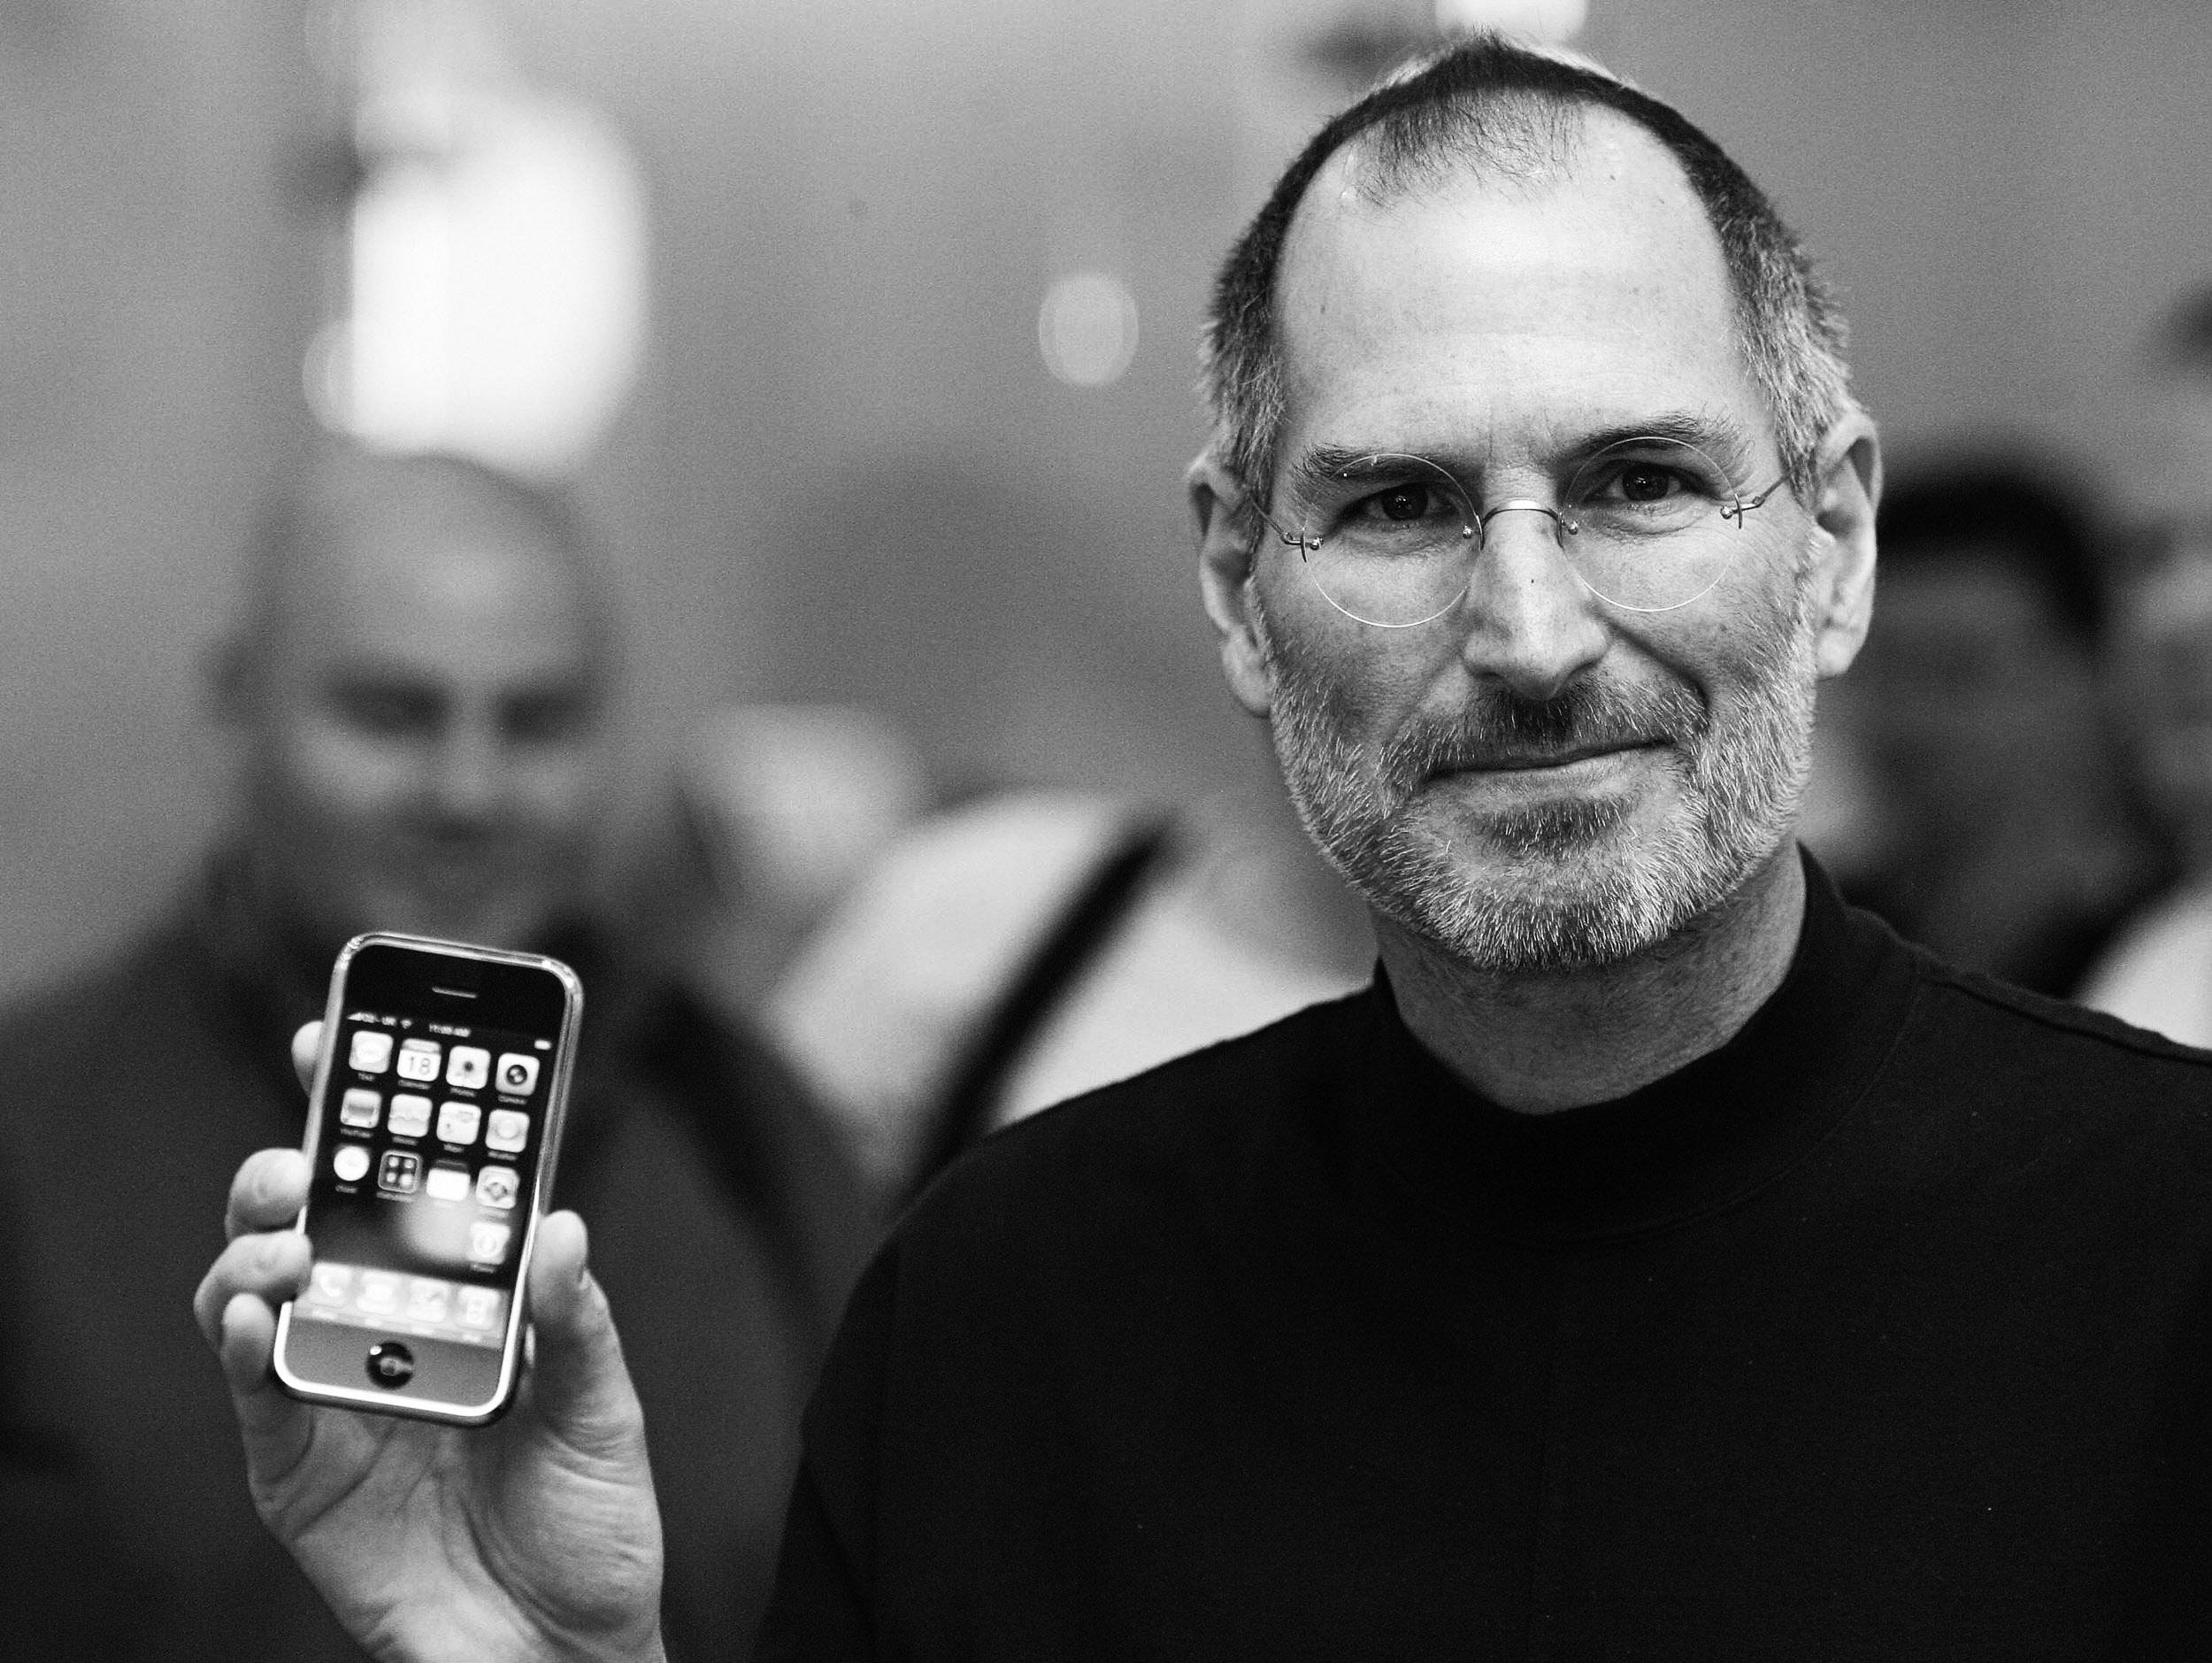 steve-jobs-iphone-mac-patent-szabadalom-apple.jpg